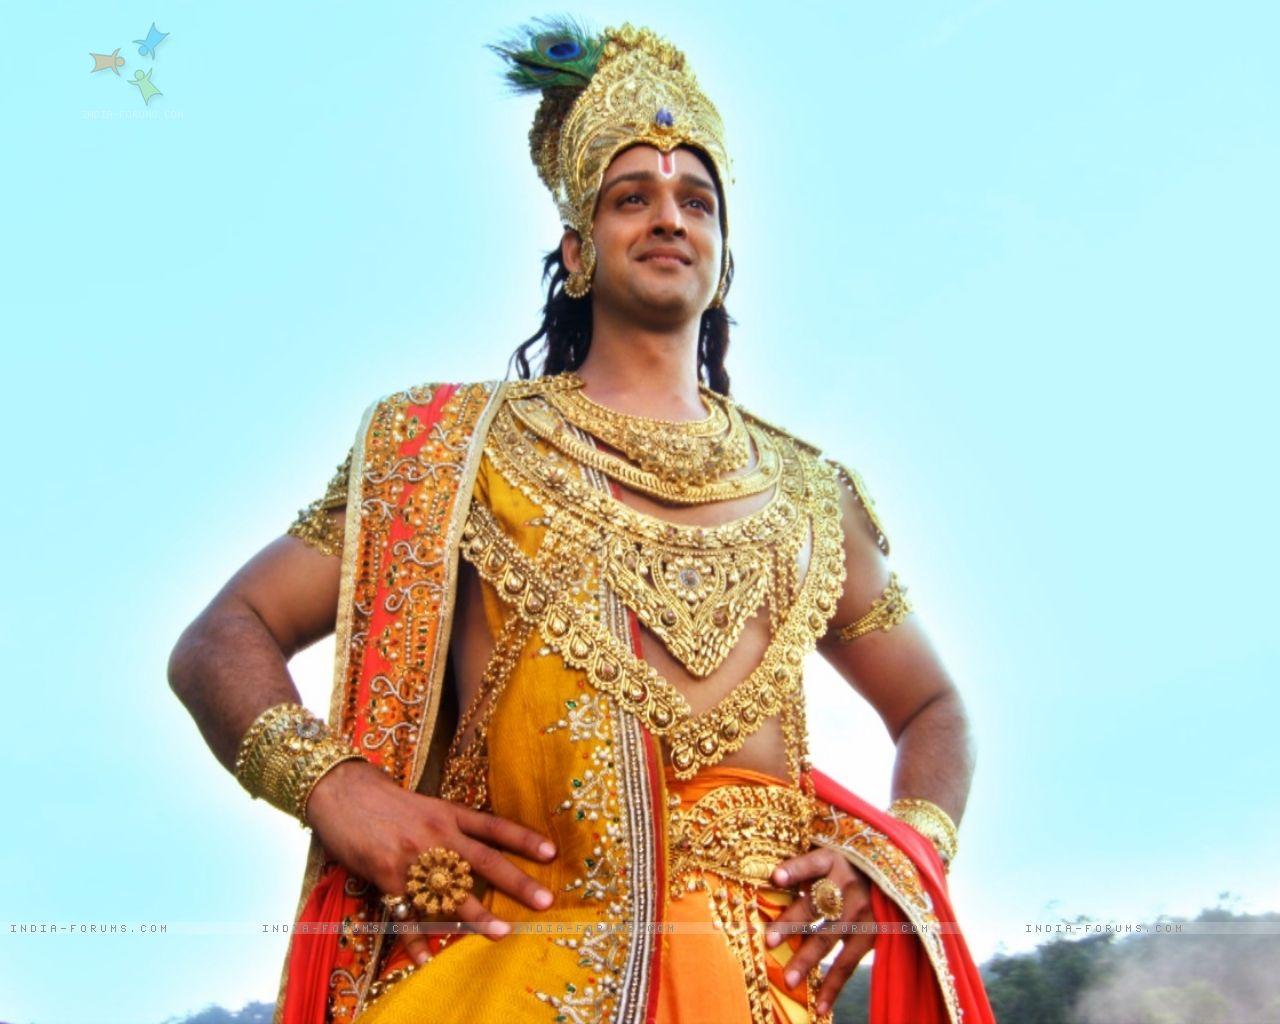 Profil krishna mahabharata serial